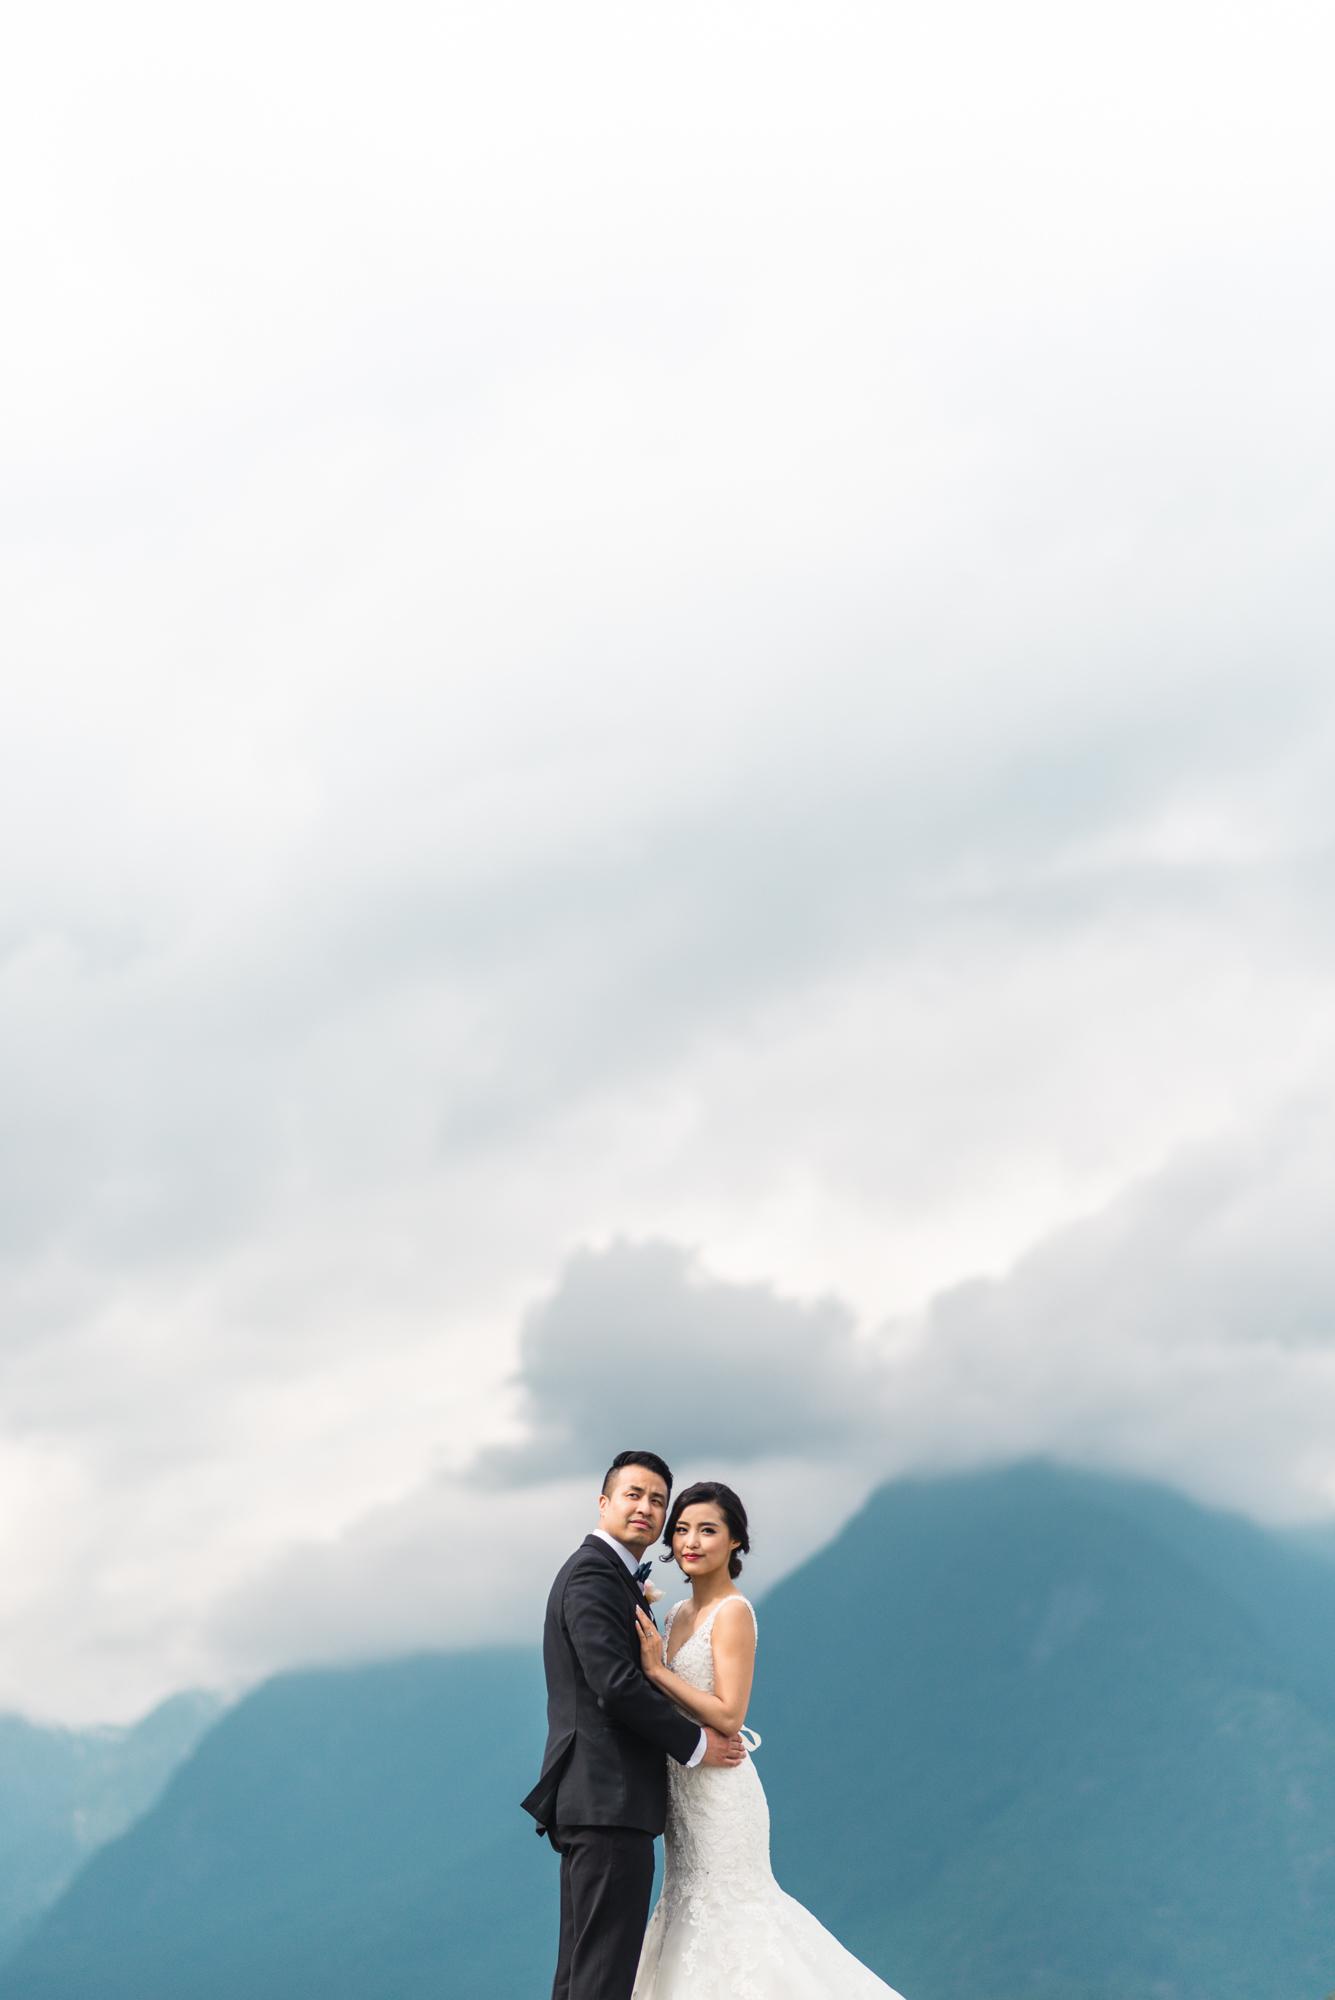 20170610-Wedding_RebeccaAndSunny-81.jpg